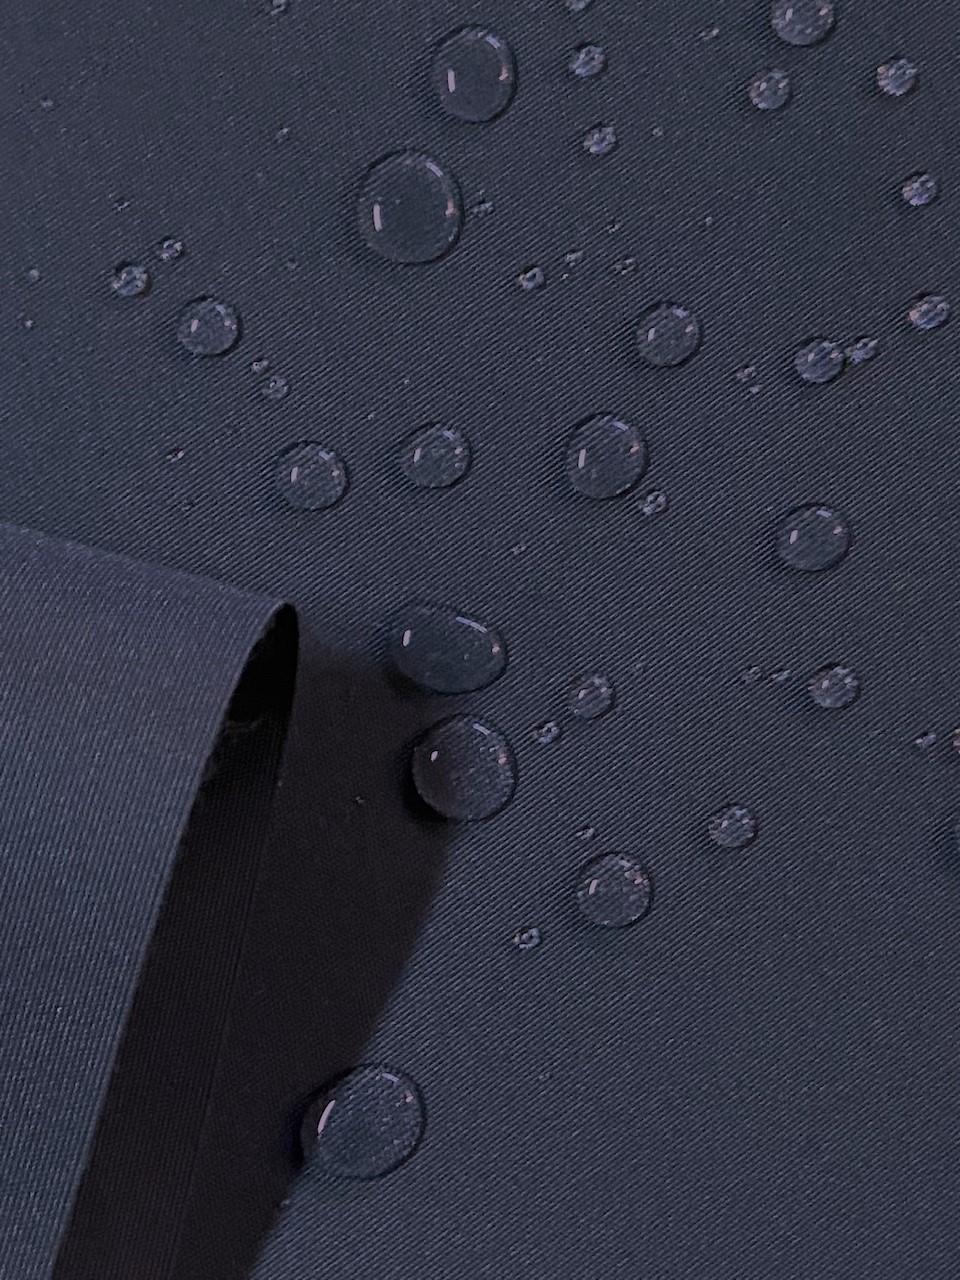 KONDOR Fabric, weight 287g/m², width 150cm, dark blue. Price per meter, 21% VAT incl.